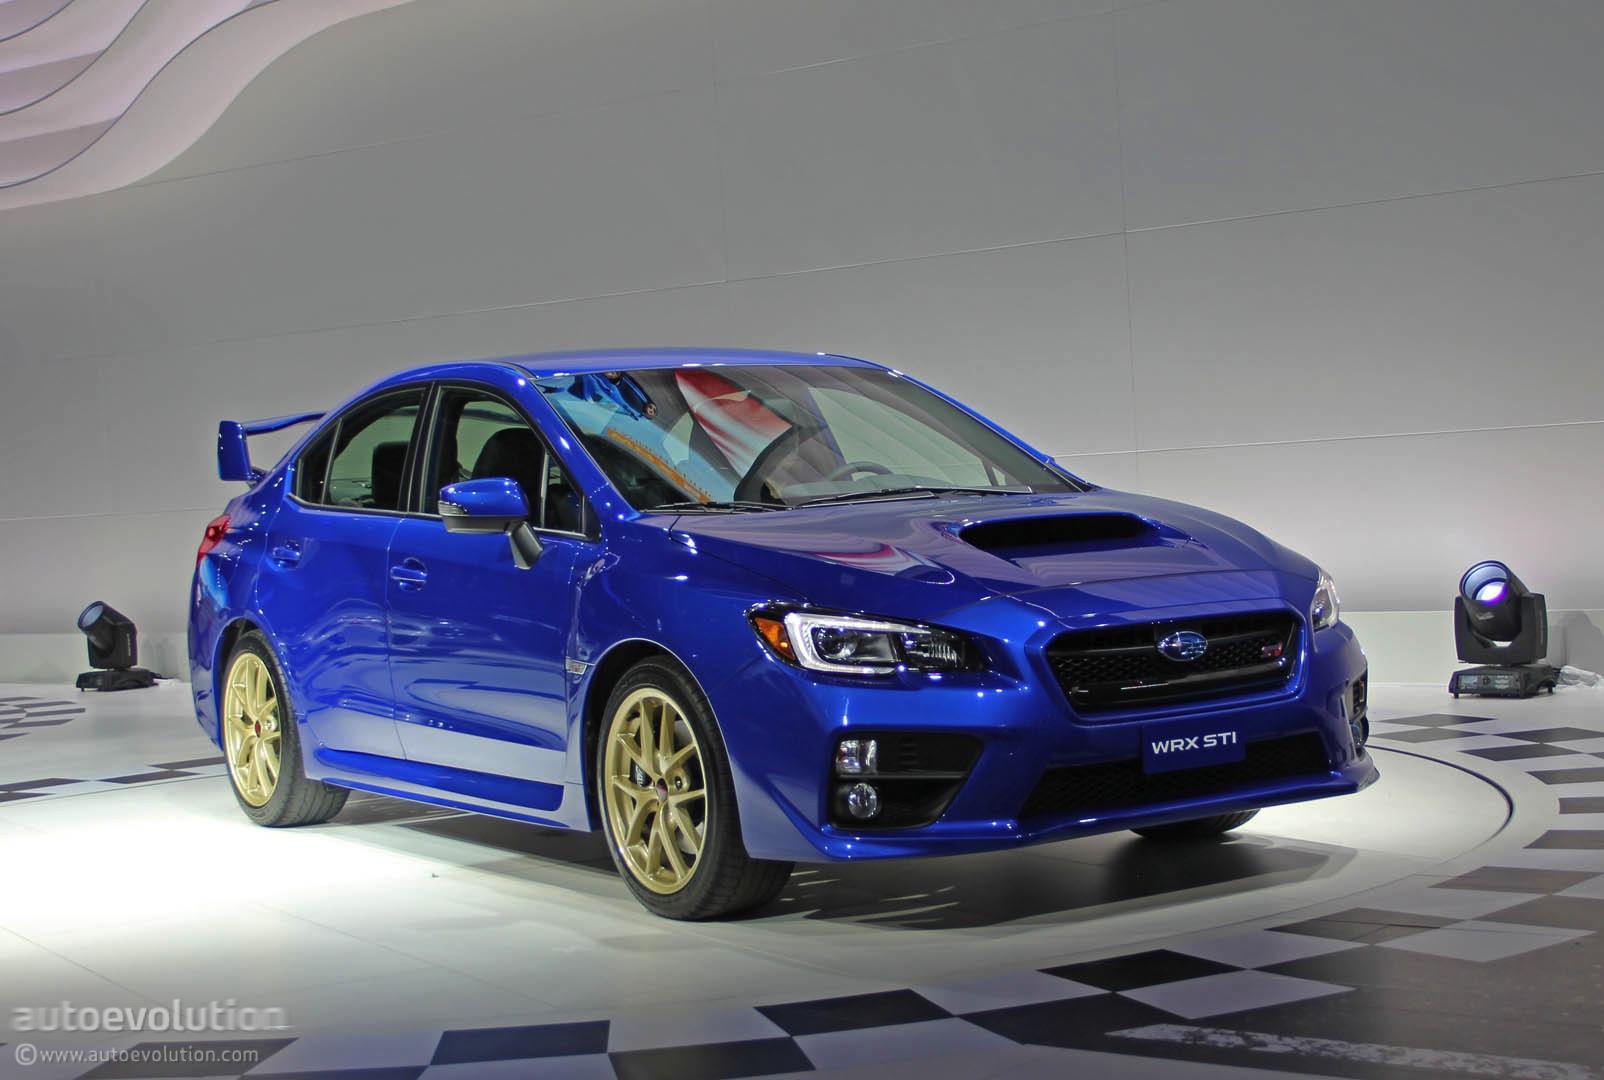 2015 Subaru Wrx Sti Is Winged To The Teeth Live Photos